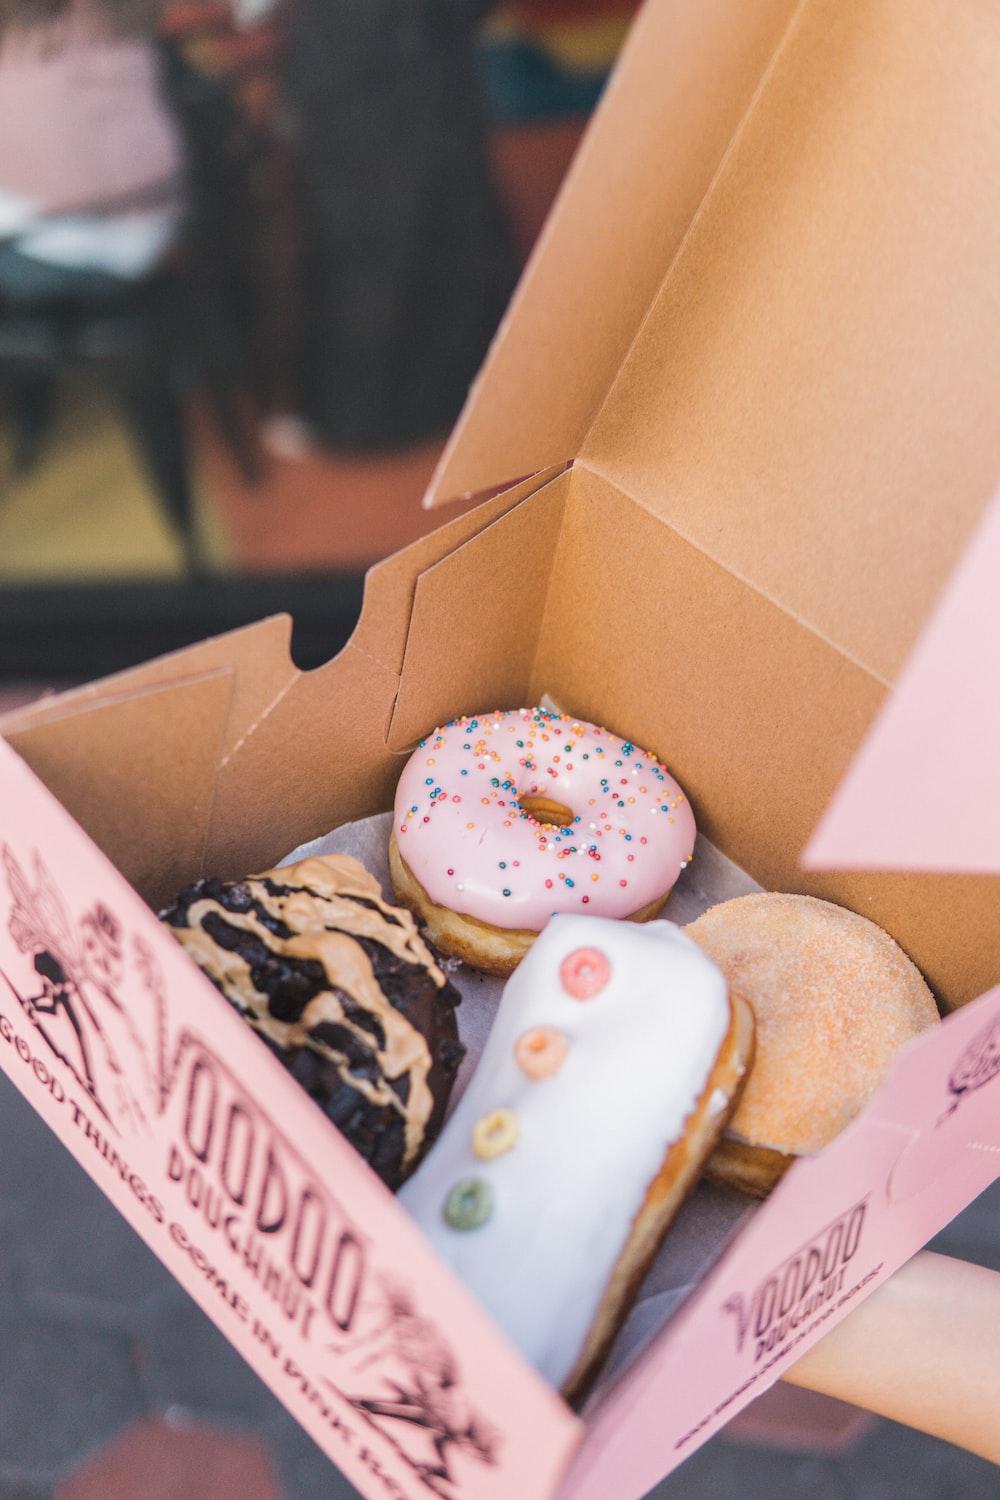 Voodoo donuts in box